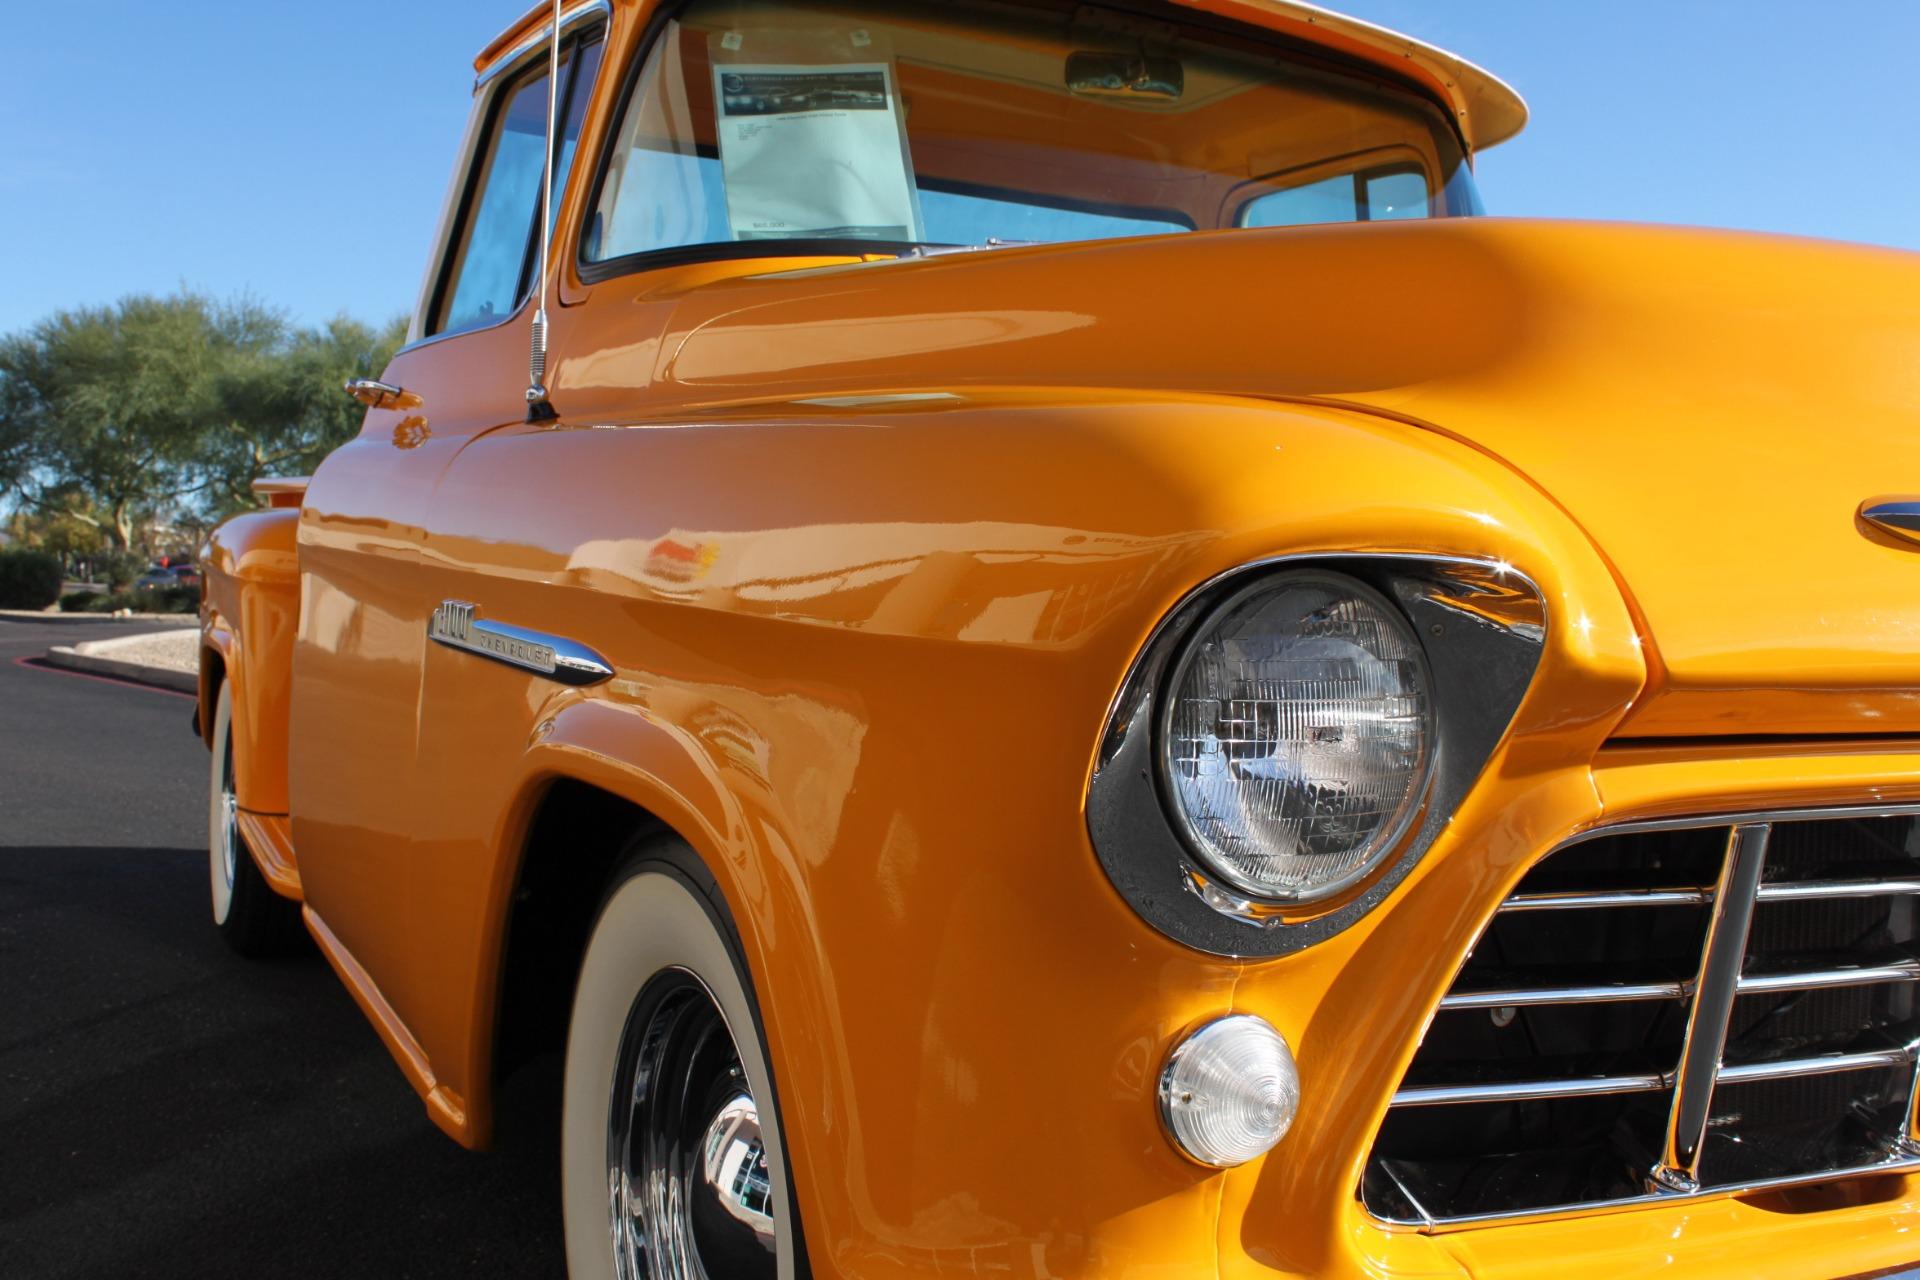 Used-1955-Chevrolet-3100-Pickup-Truck-Chalenger